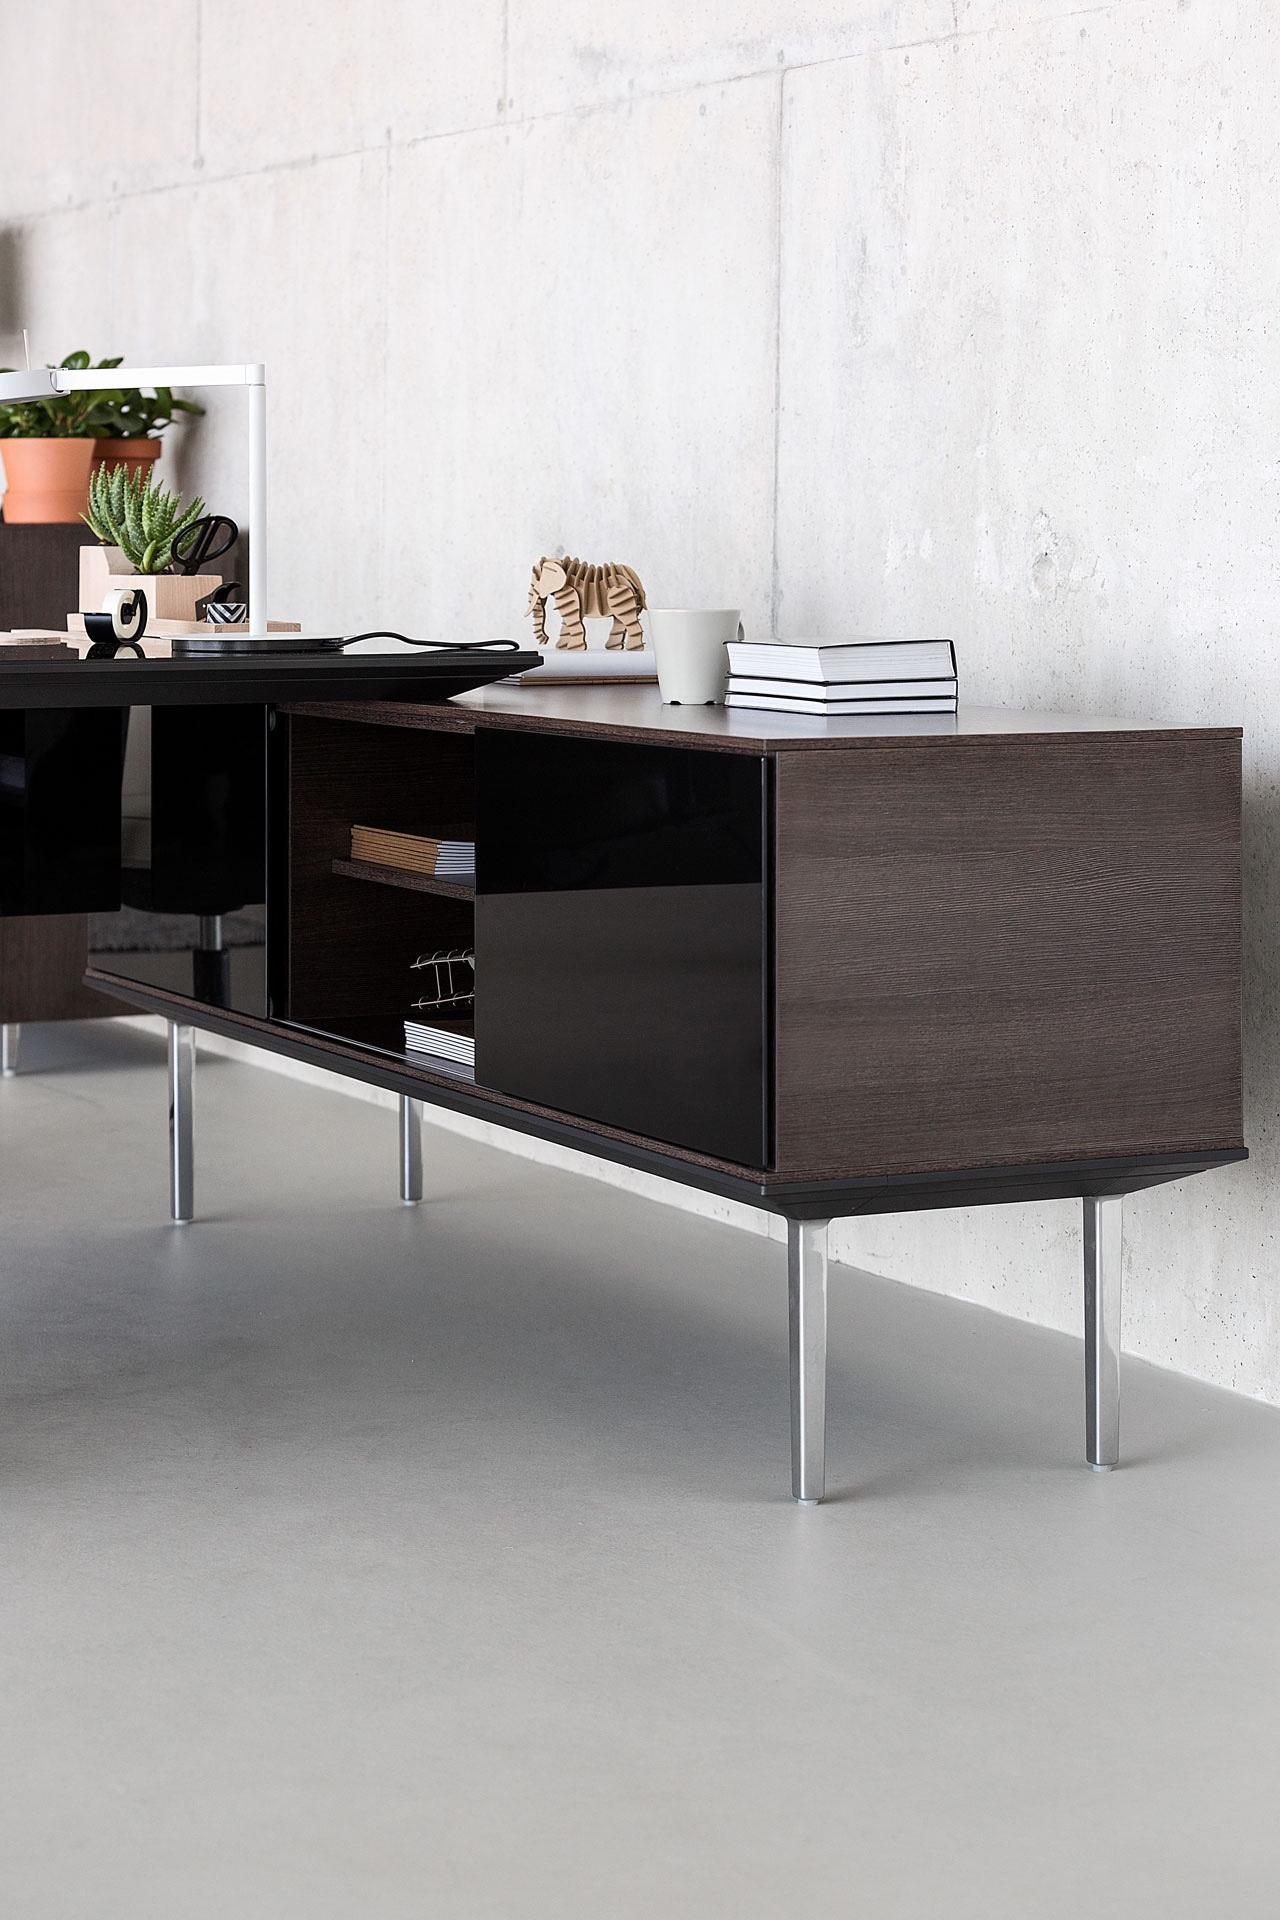 Longo by designers Ramos & Bassols.